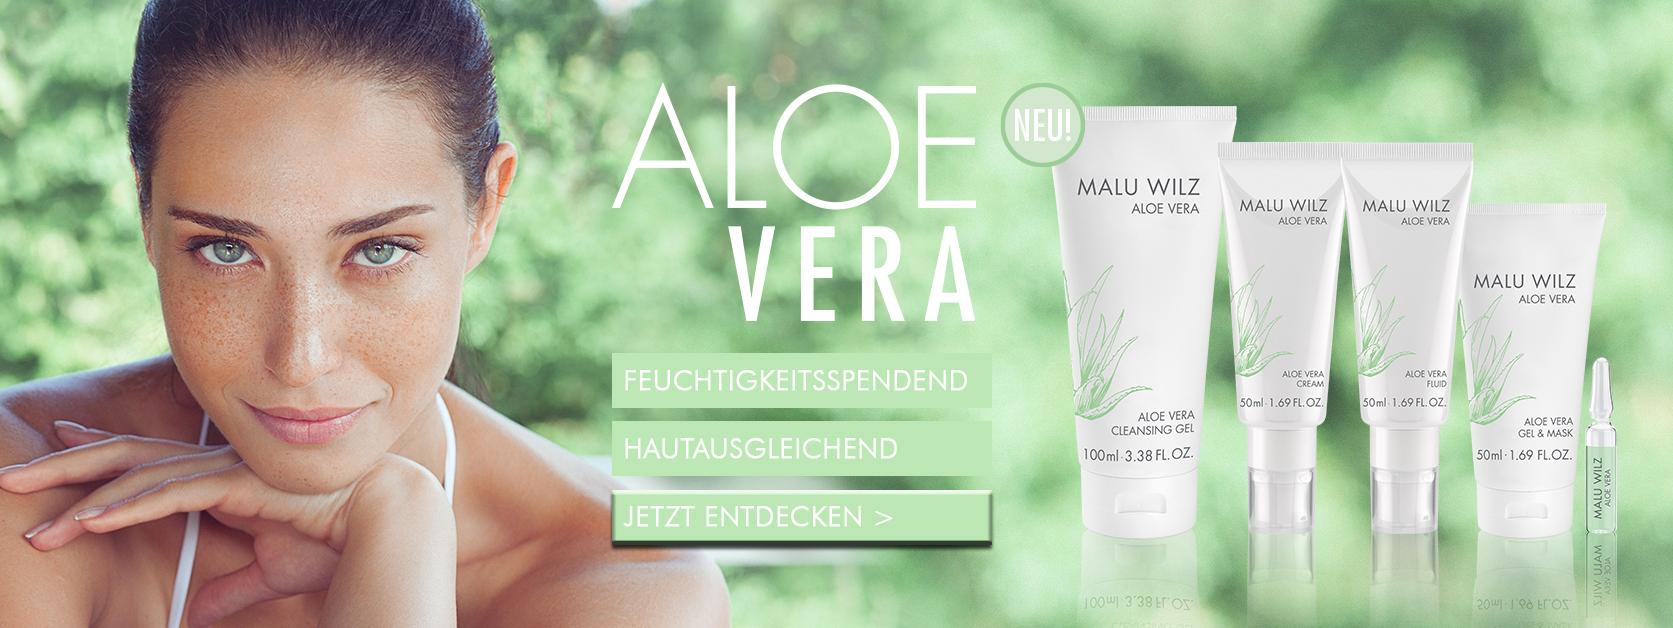 Frau mit Aloe Vera Kosmetik